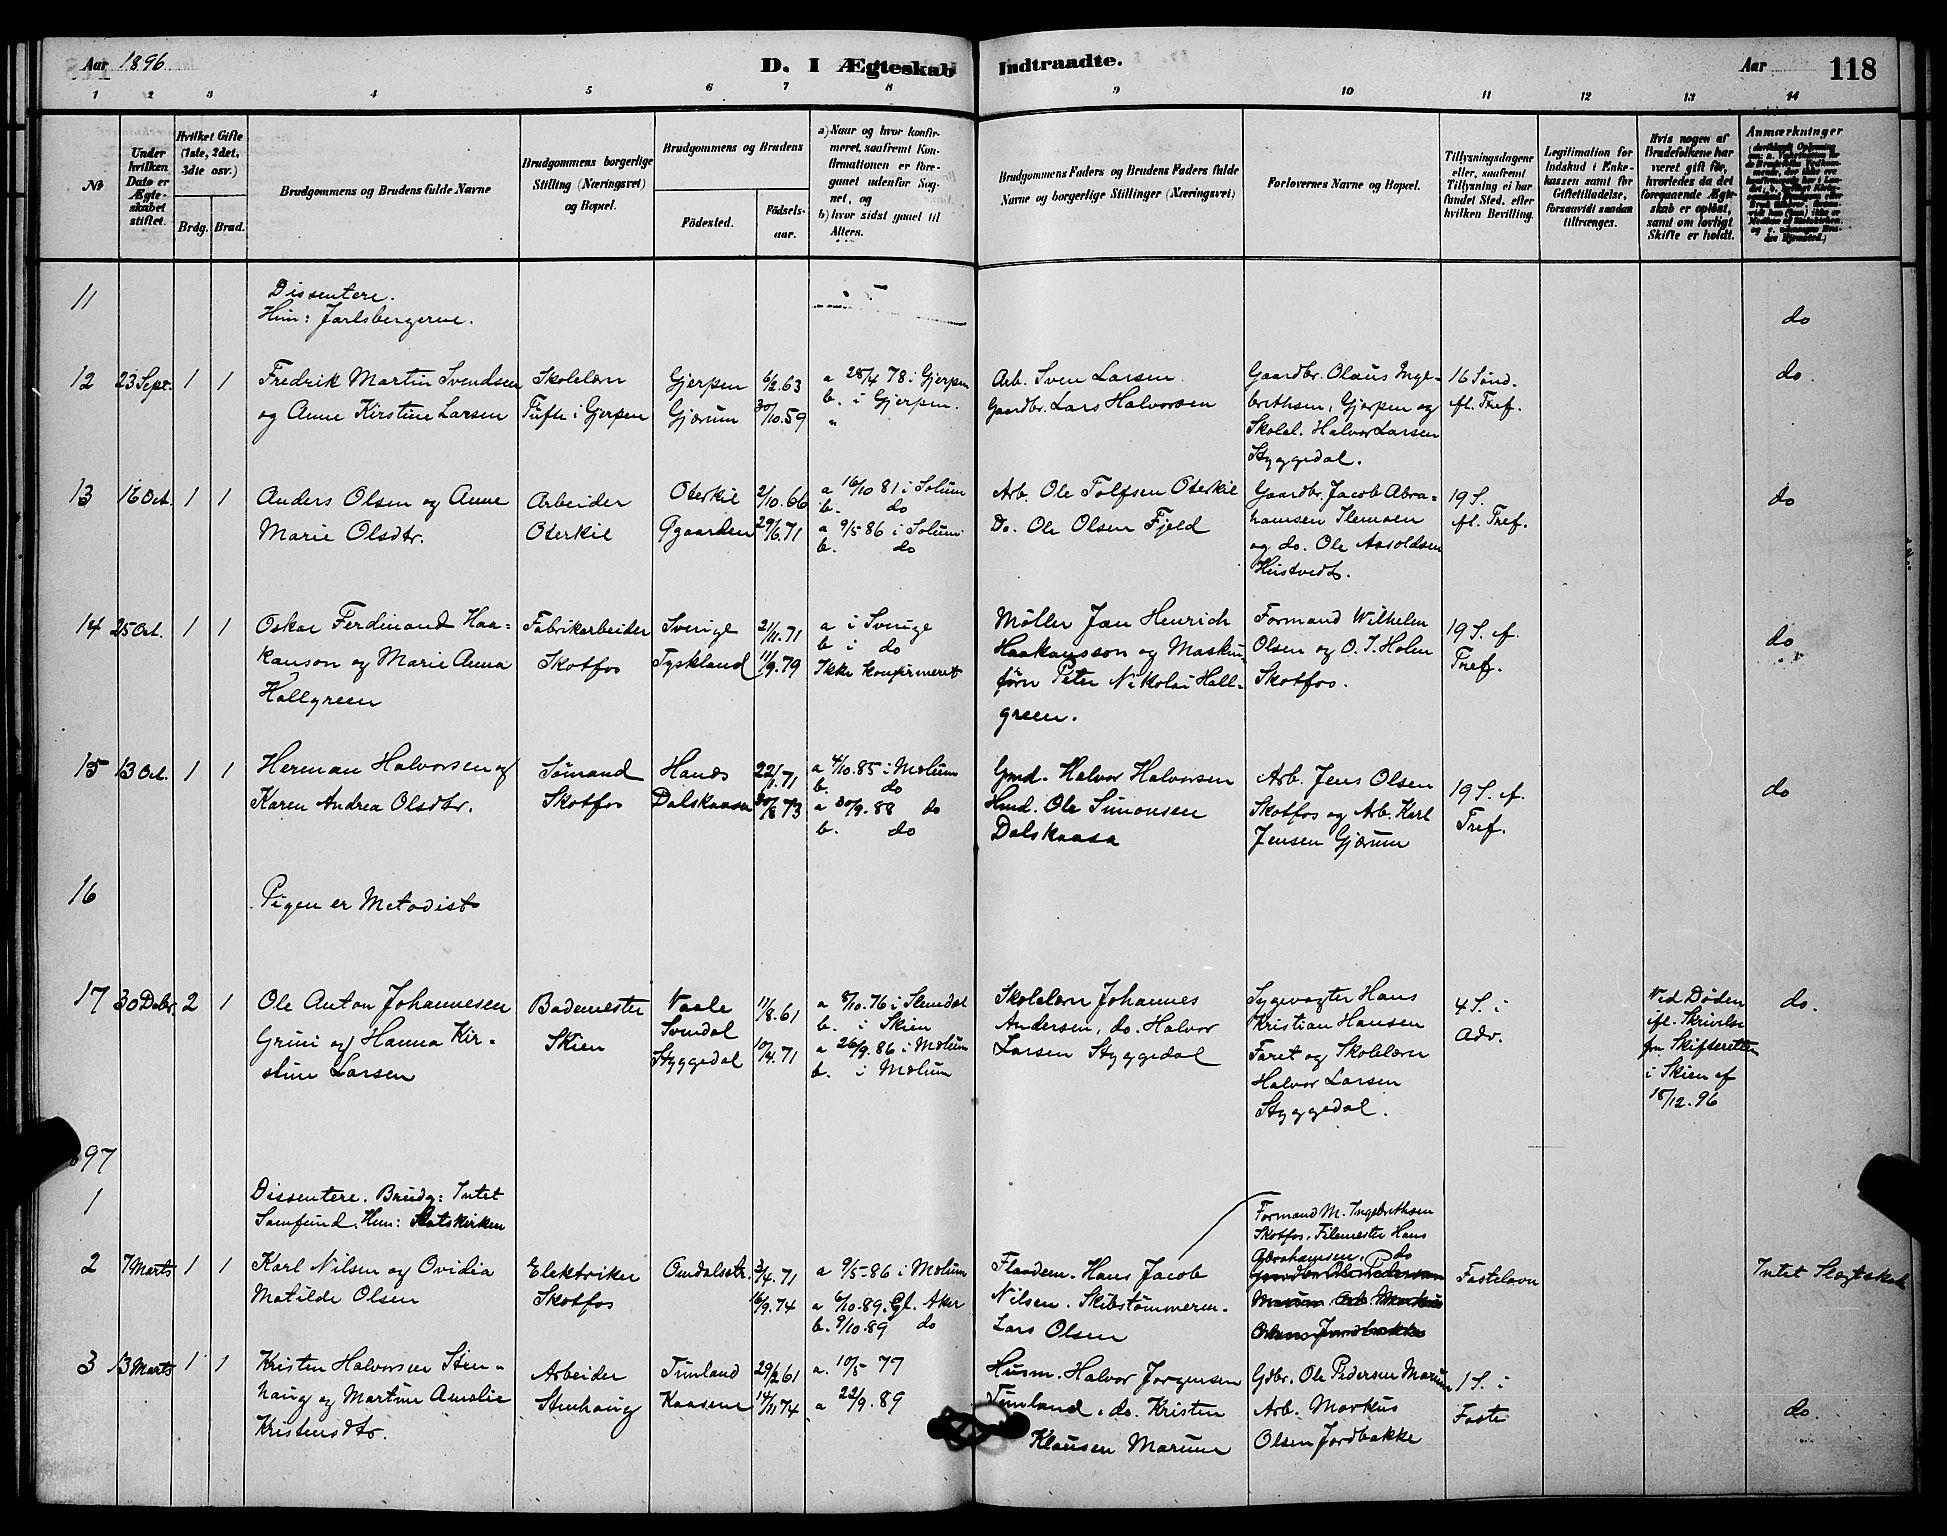 SAKO, Solum kirkebøker, G/Gb/L0003: Klokkerbok nr. II 3, 1880-1898, s. 118